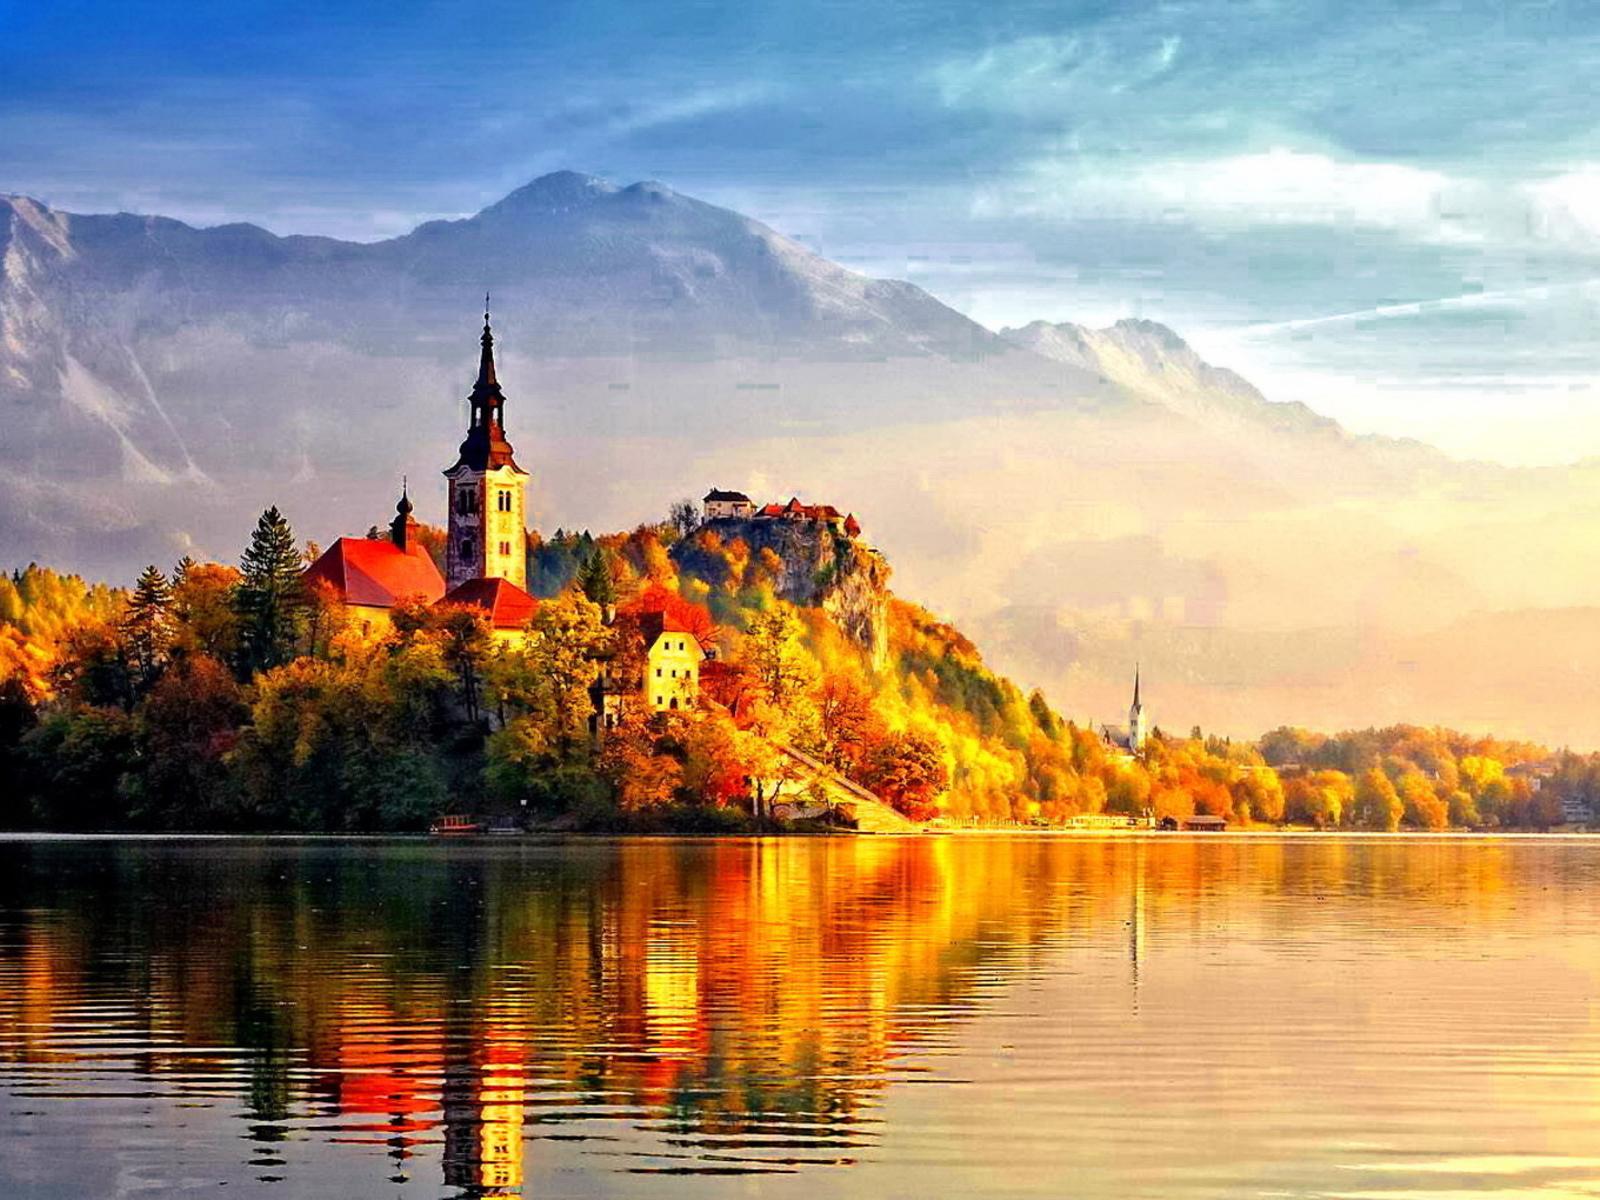 Upstate New York Fall Hd Wallpaper Beautiful Castle In The Light Of Autumn Sun Hd Wallpaper